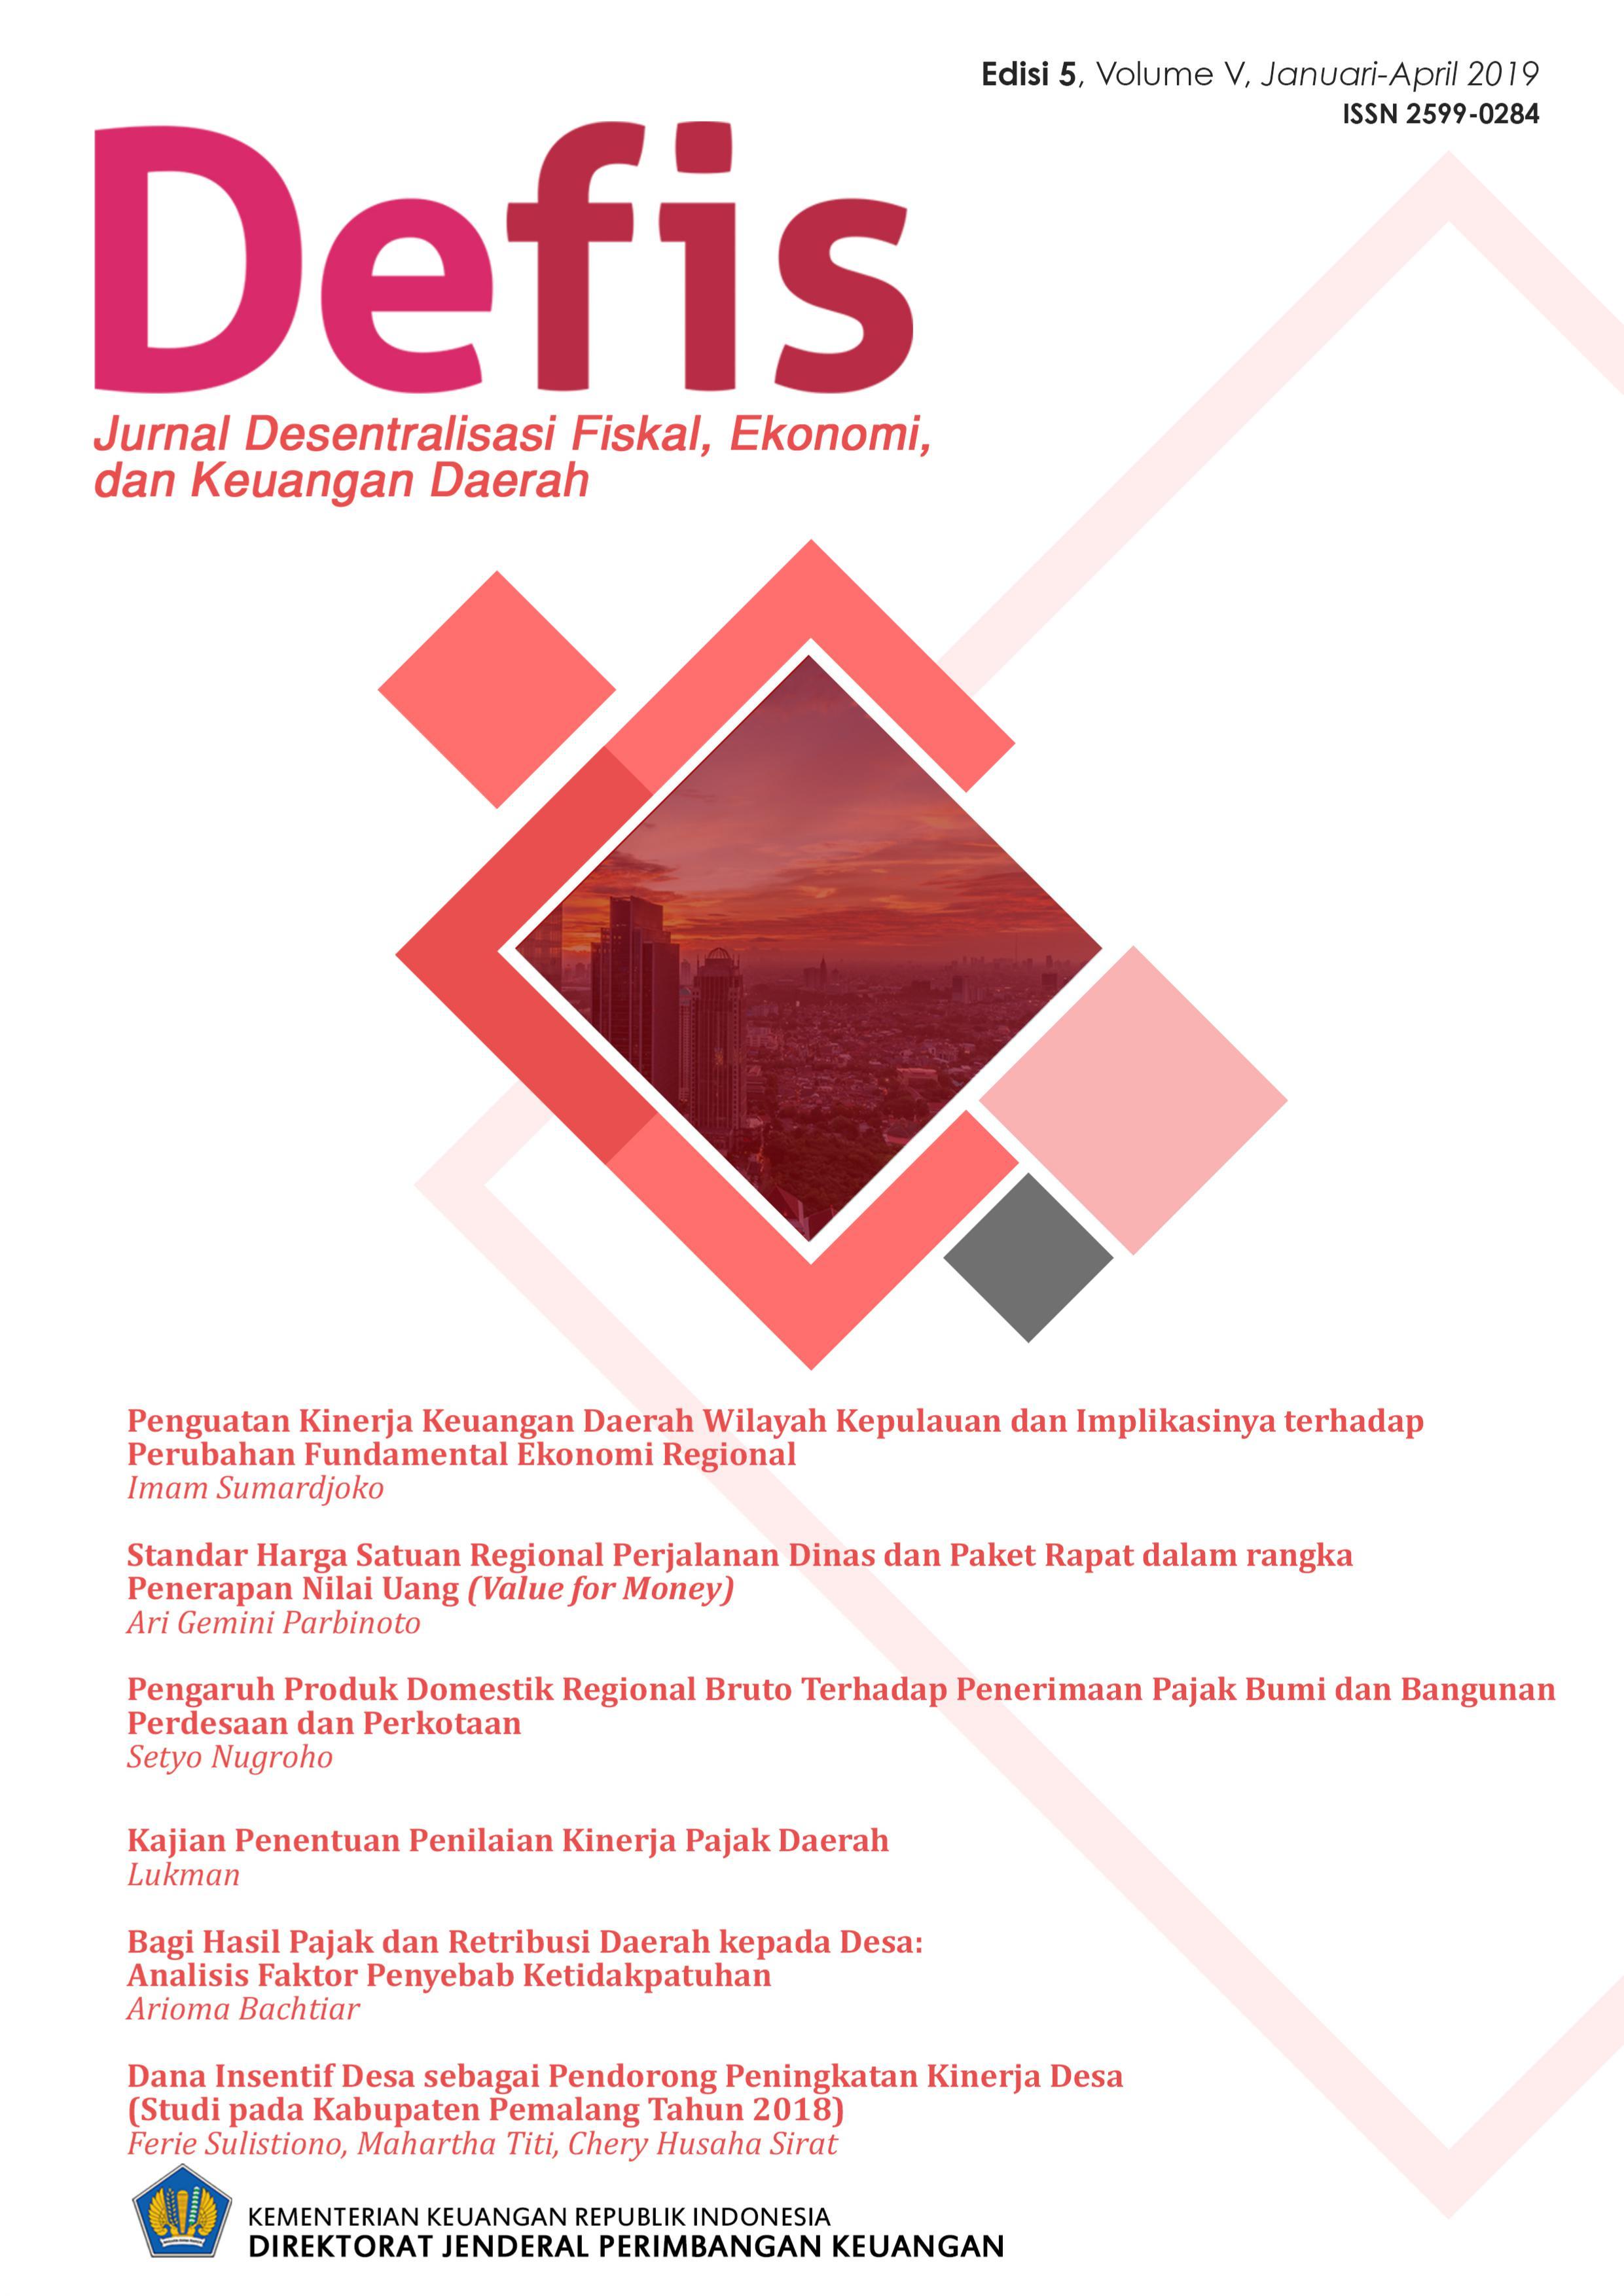 Jurnal Defis Edisi 5